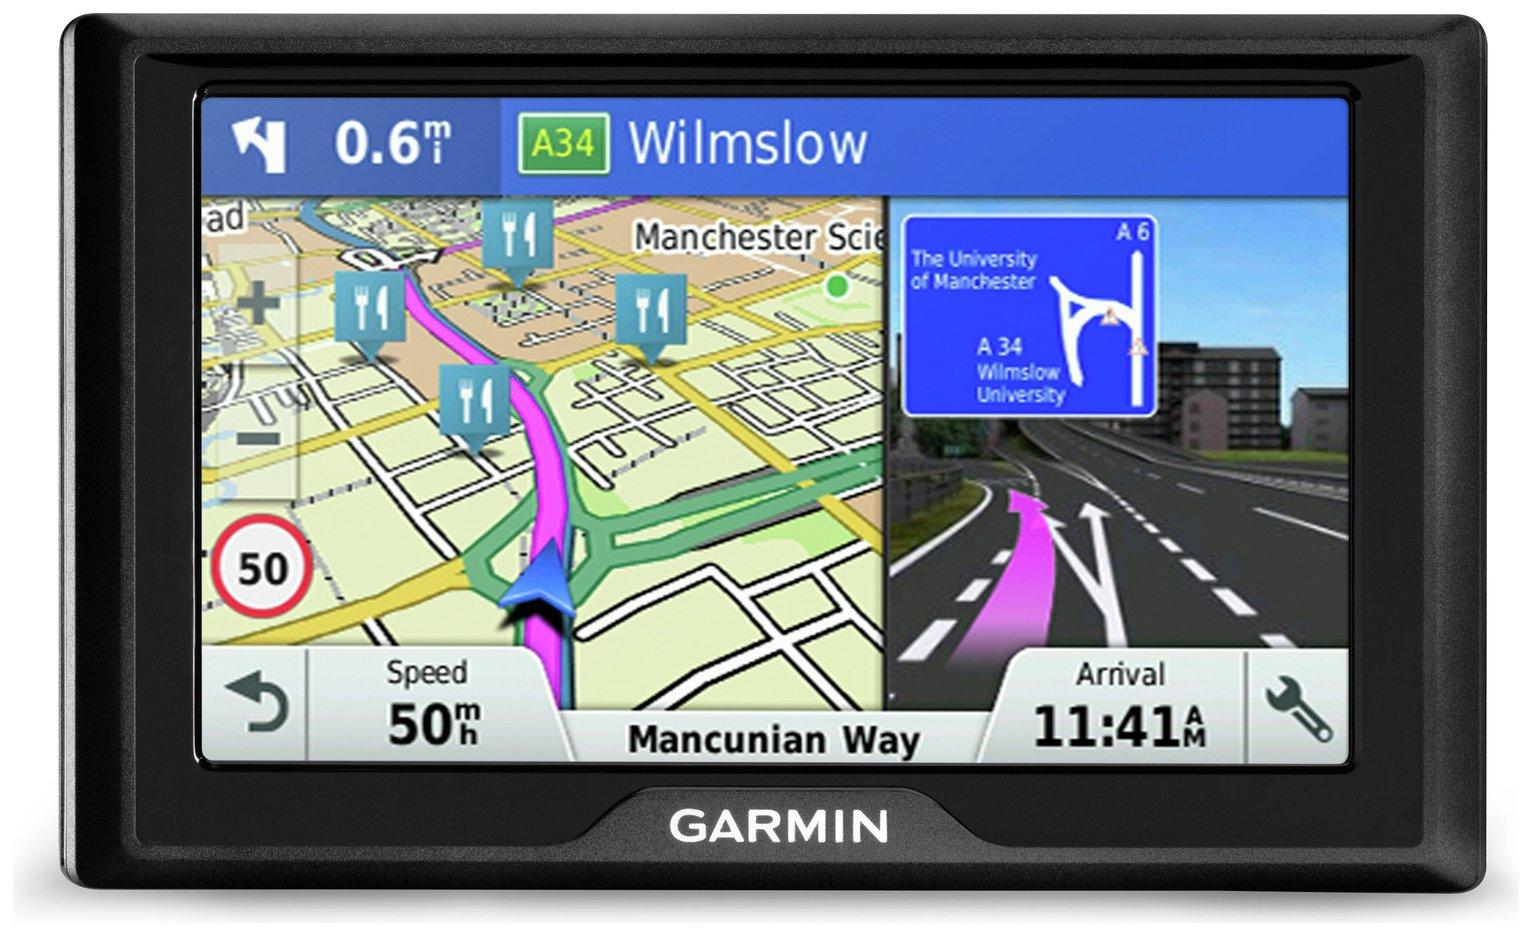 Garmin Drive 40LM 4.3 Inch Sat Nav with Lifetime Maps UK & Western Europe £60 at Argos